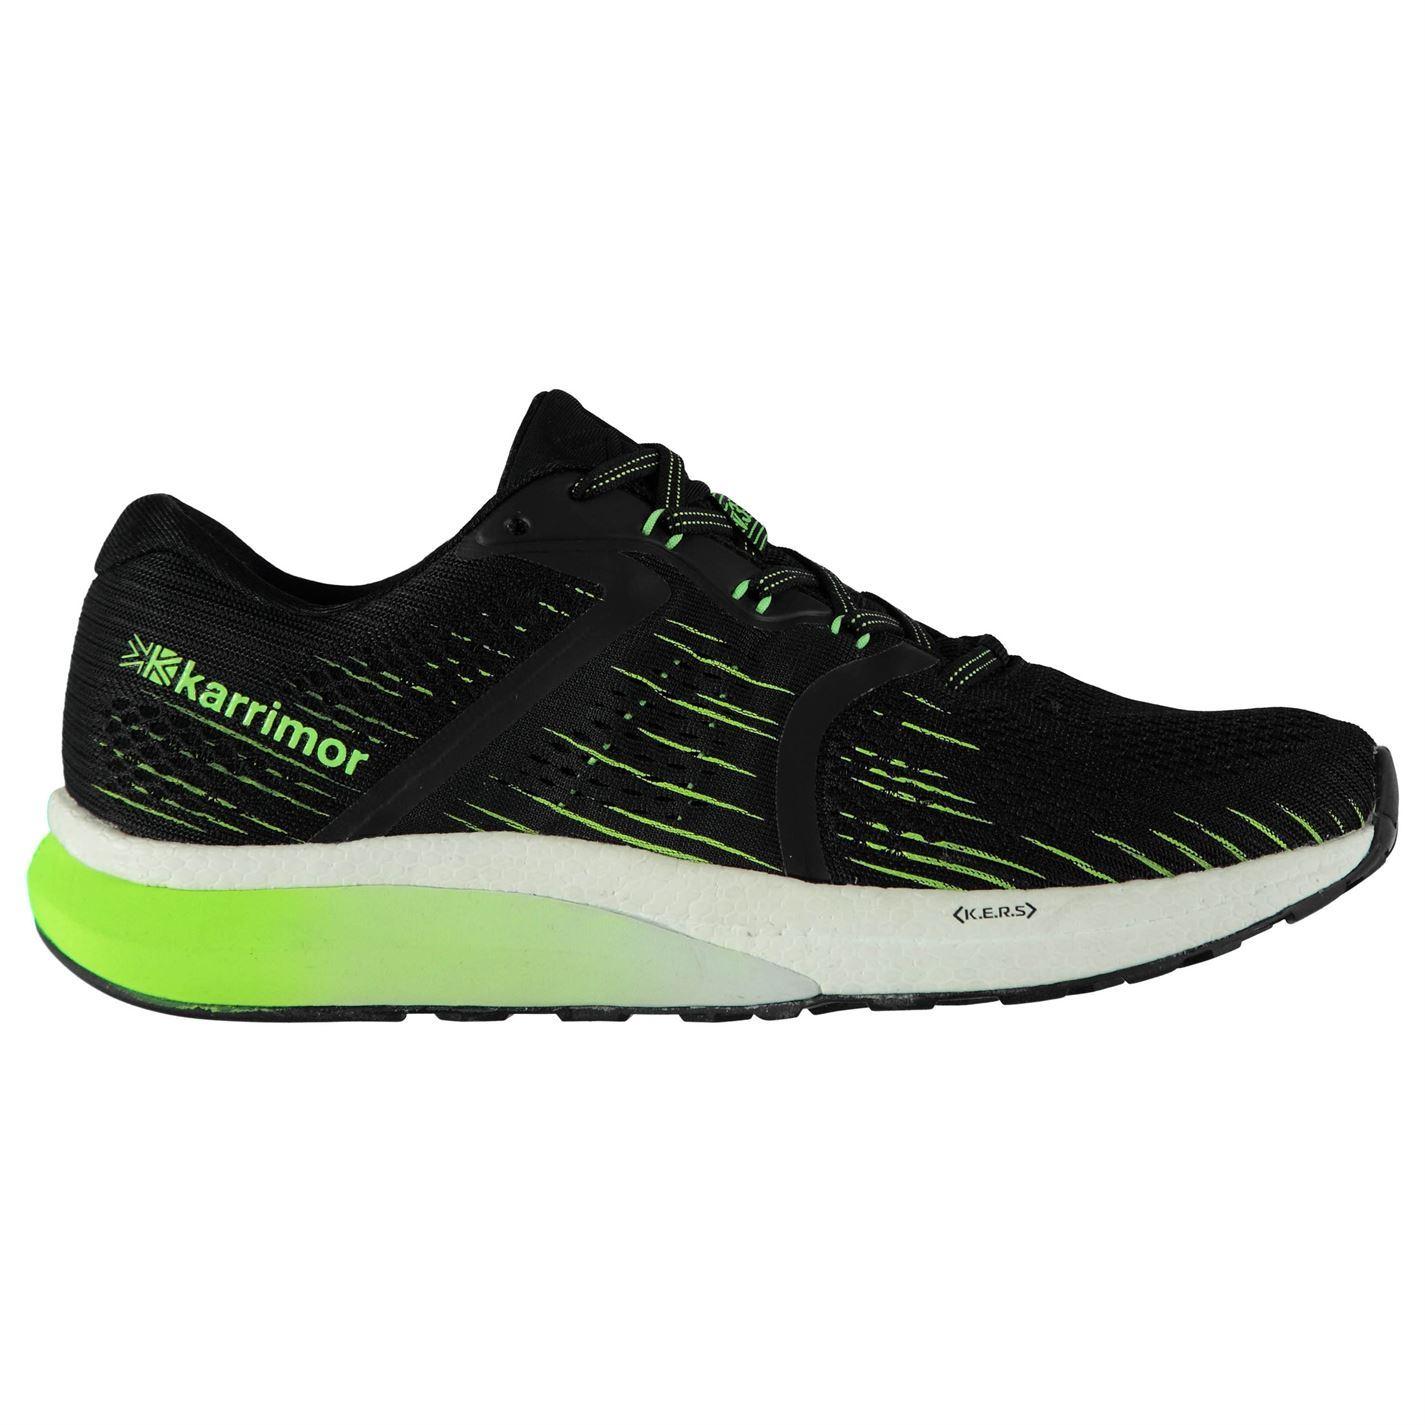 Karrimor Hombres 3 Zapatos Deportivos Excel 3 Hombres carretera 656b37